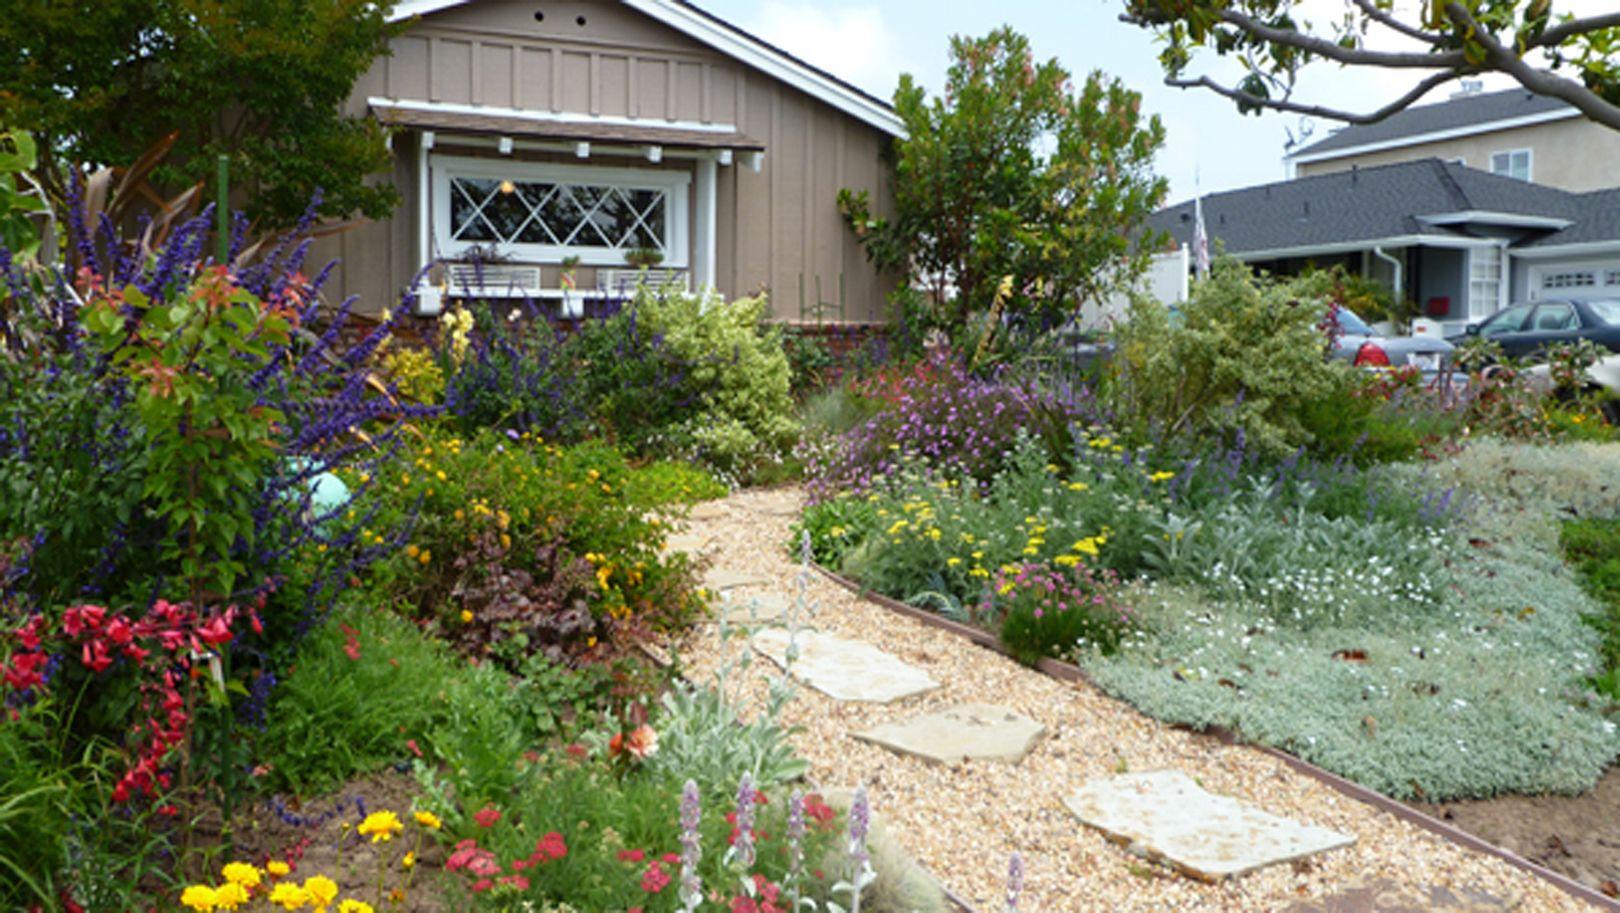 No grass front yard! | My Work: Botanica Landscape | Pinterest on No Grass Yard Ideas id=90389